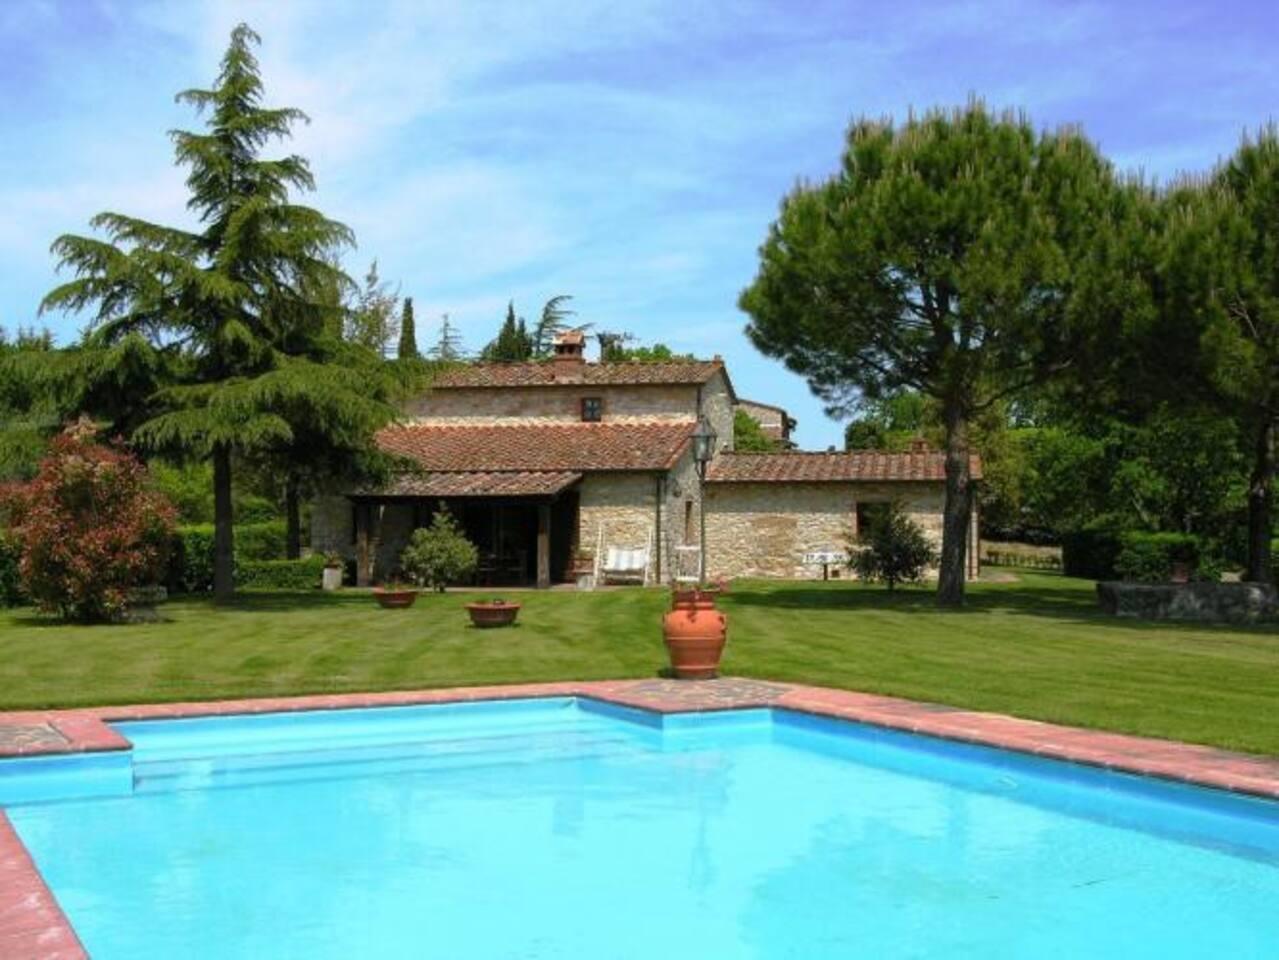 Fiorita exterior with swimming pool